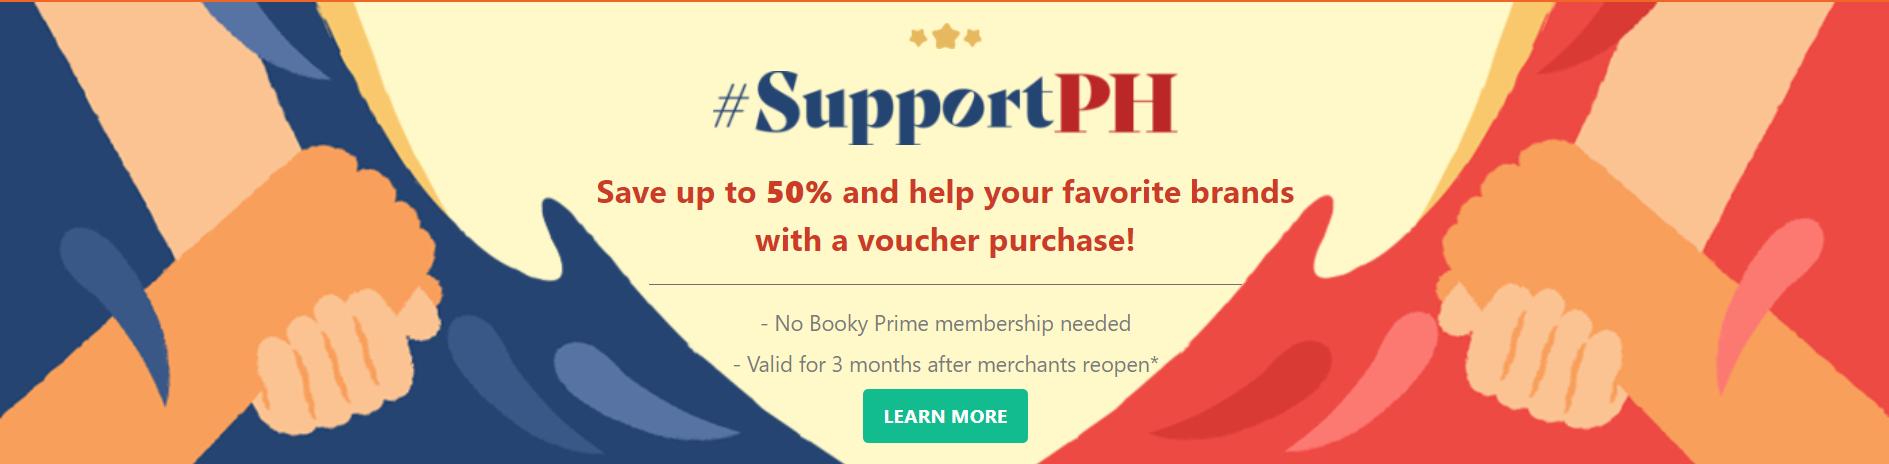 SupportPH